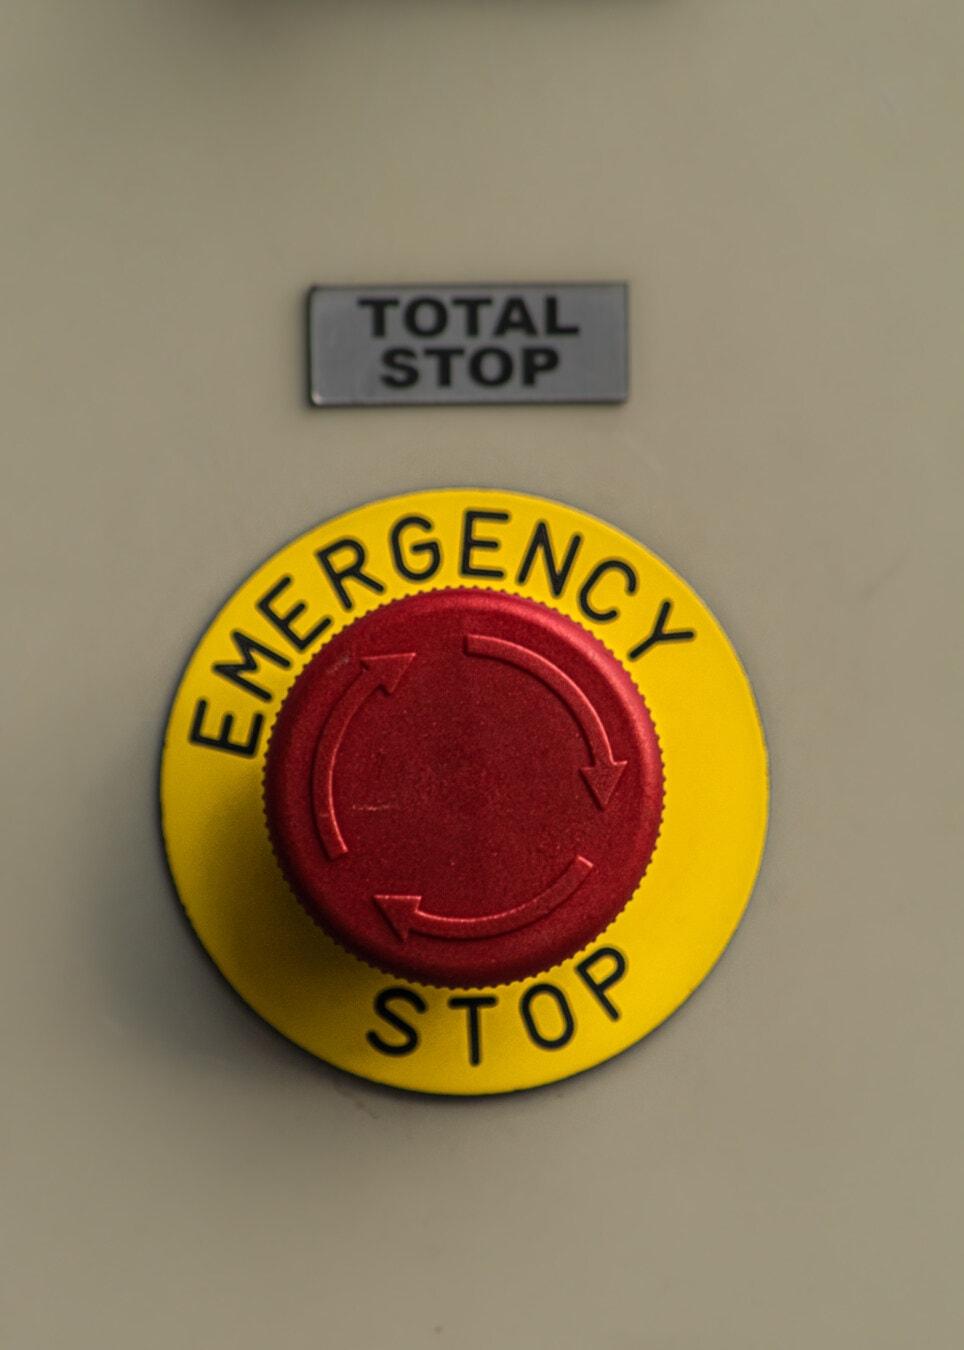 stop, emergency, button, alarm, warning, danger, industrial, sign, design, text